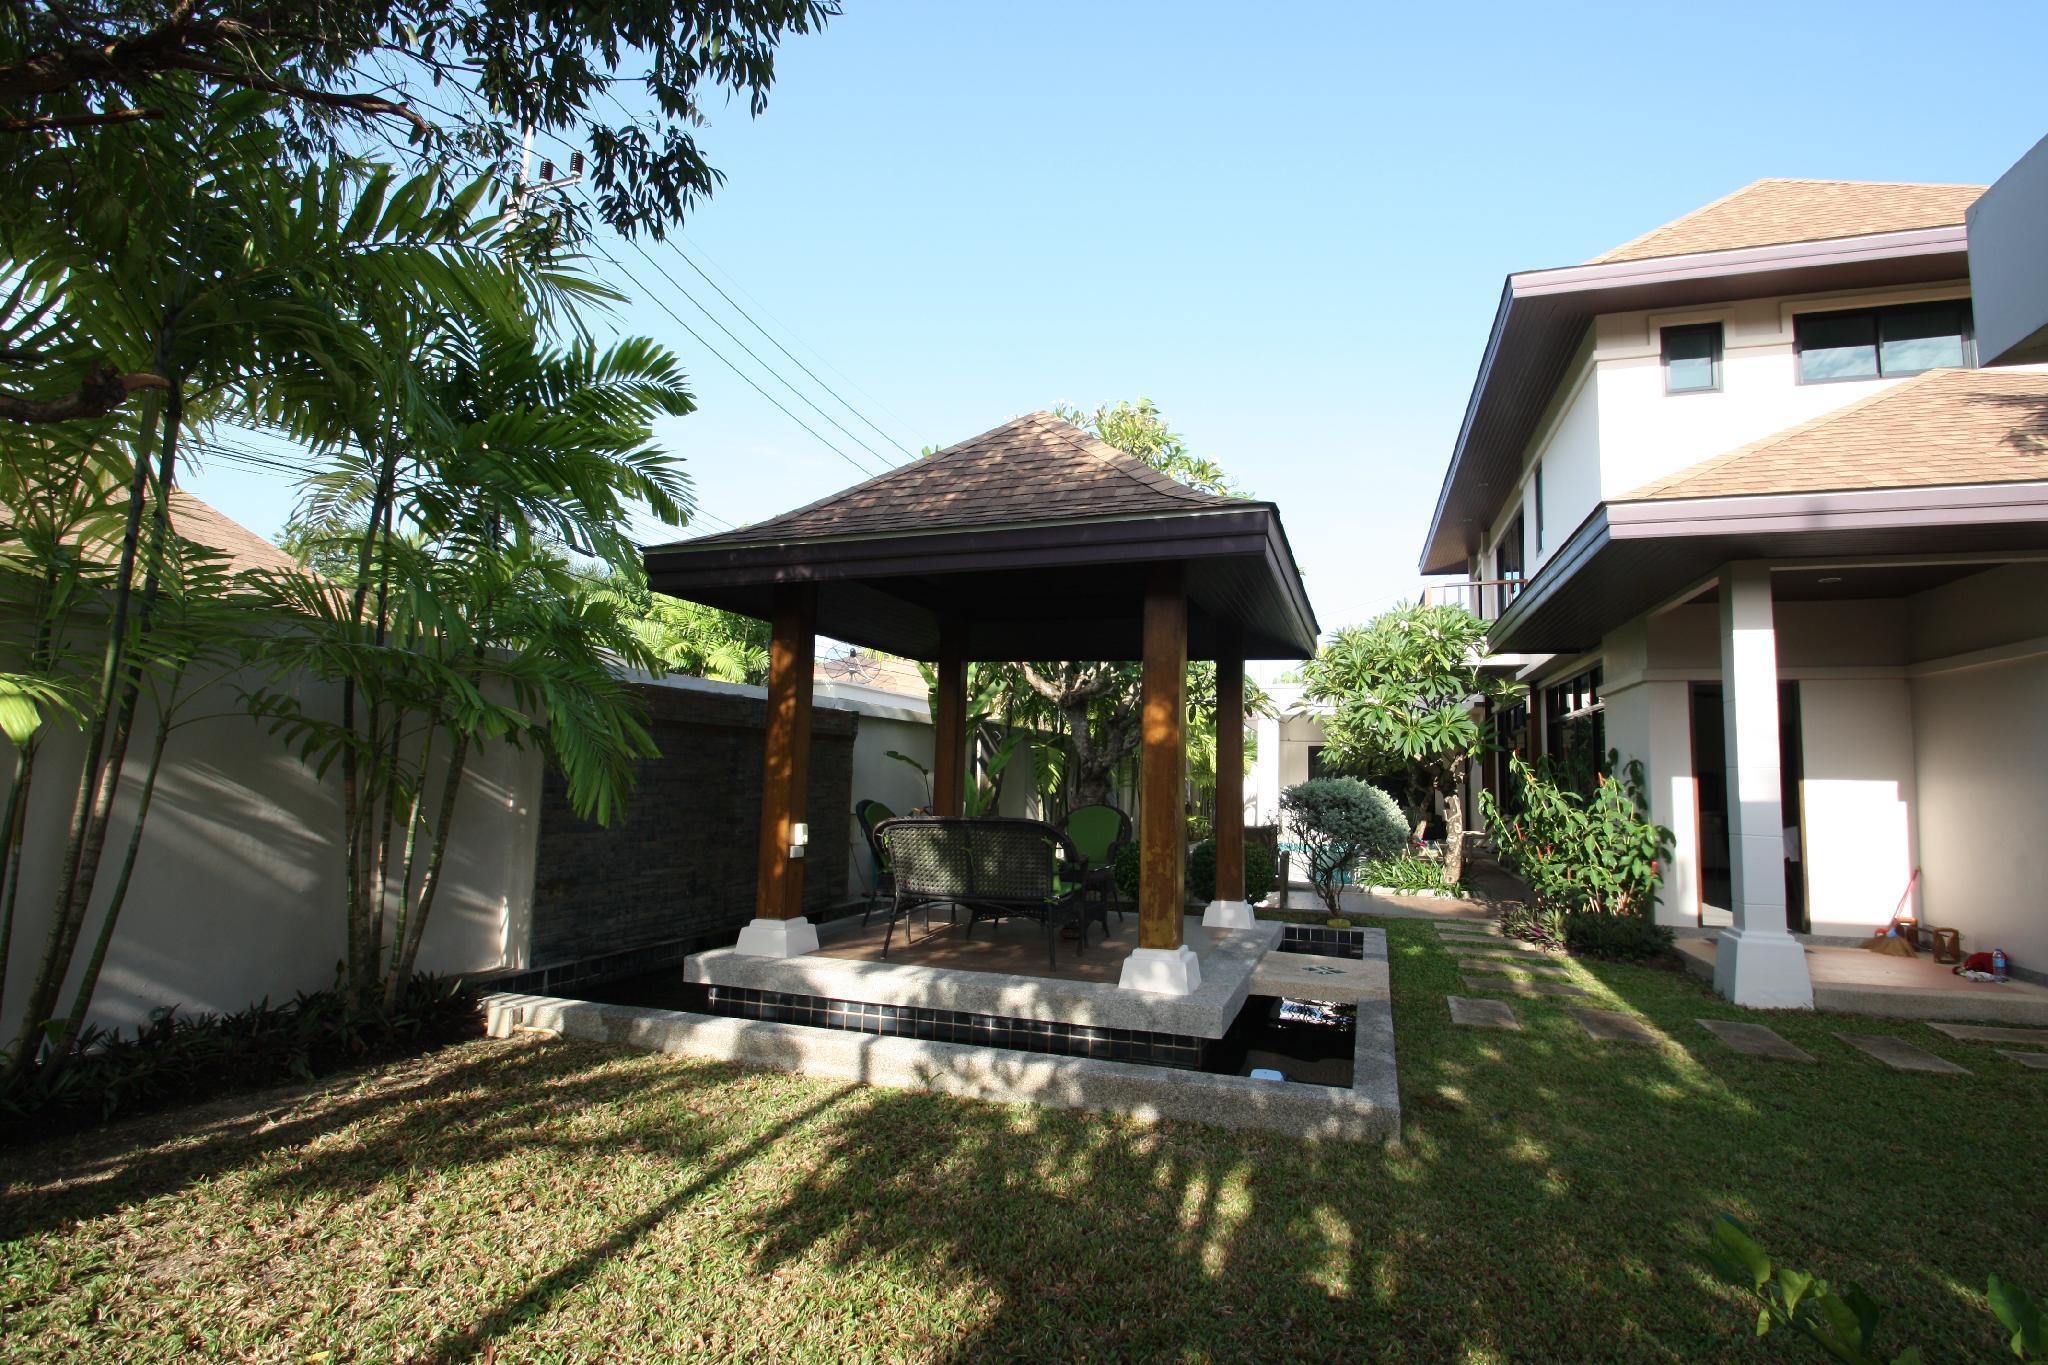 Susan Villa - Soi Namjai Viset Road, Rawai Phuket Susan Villa - Soi Namjai Viset Road, Rawai Phuket